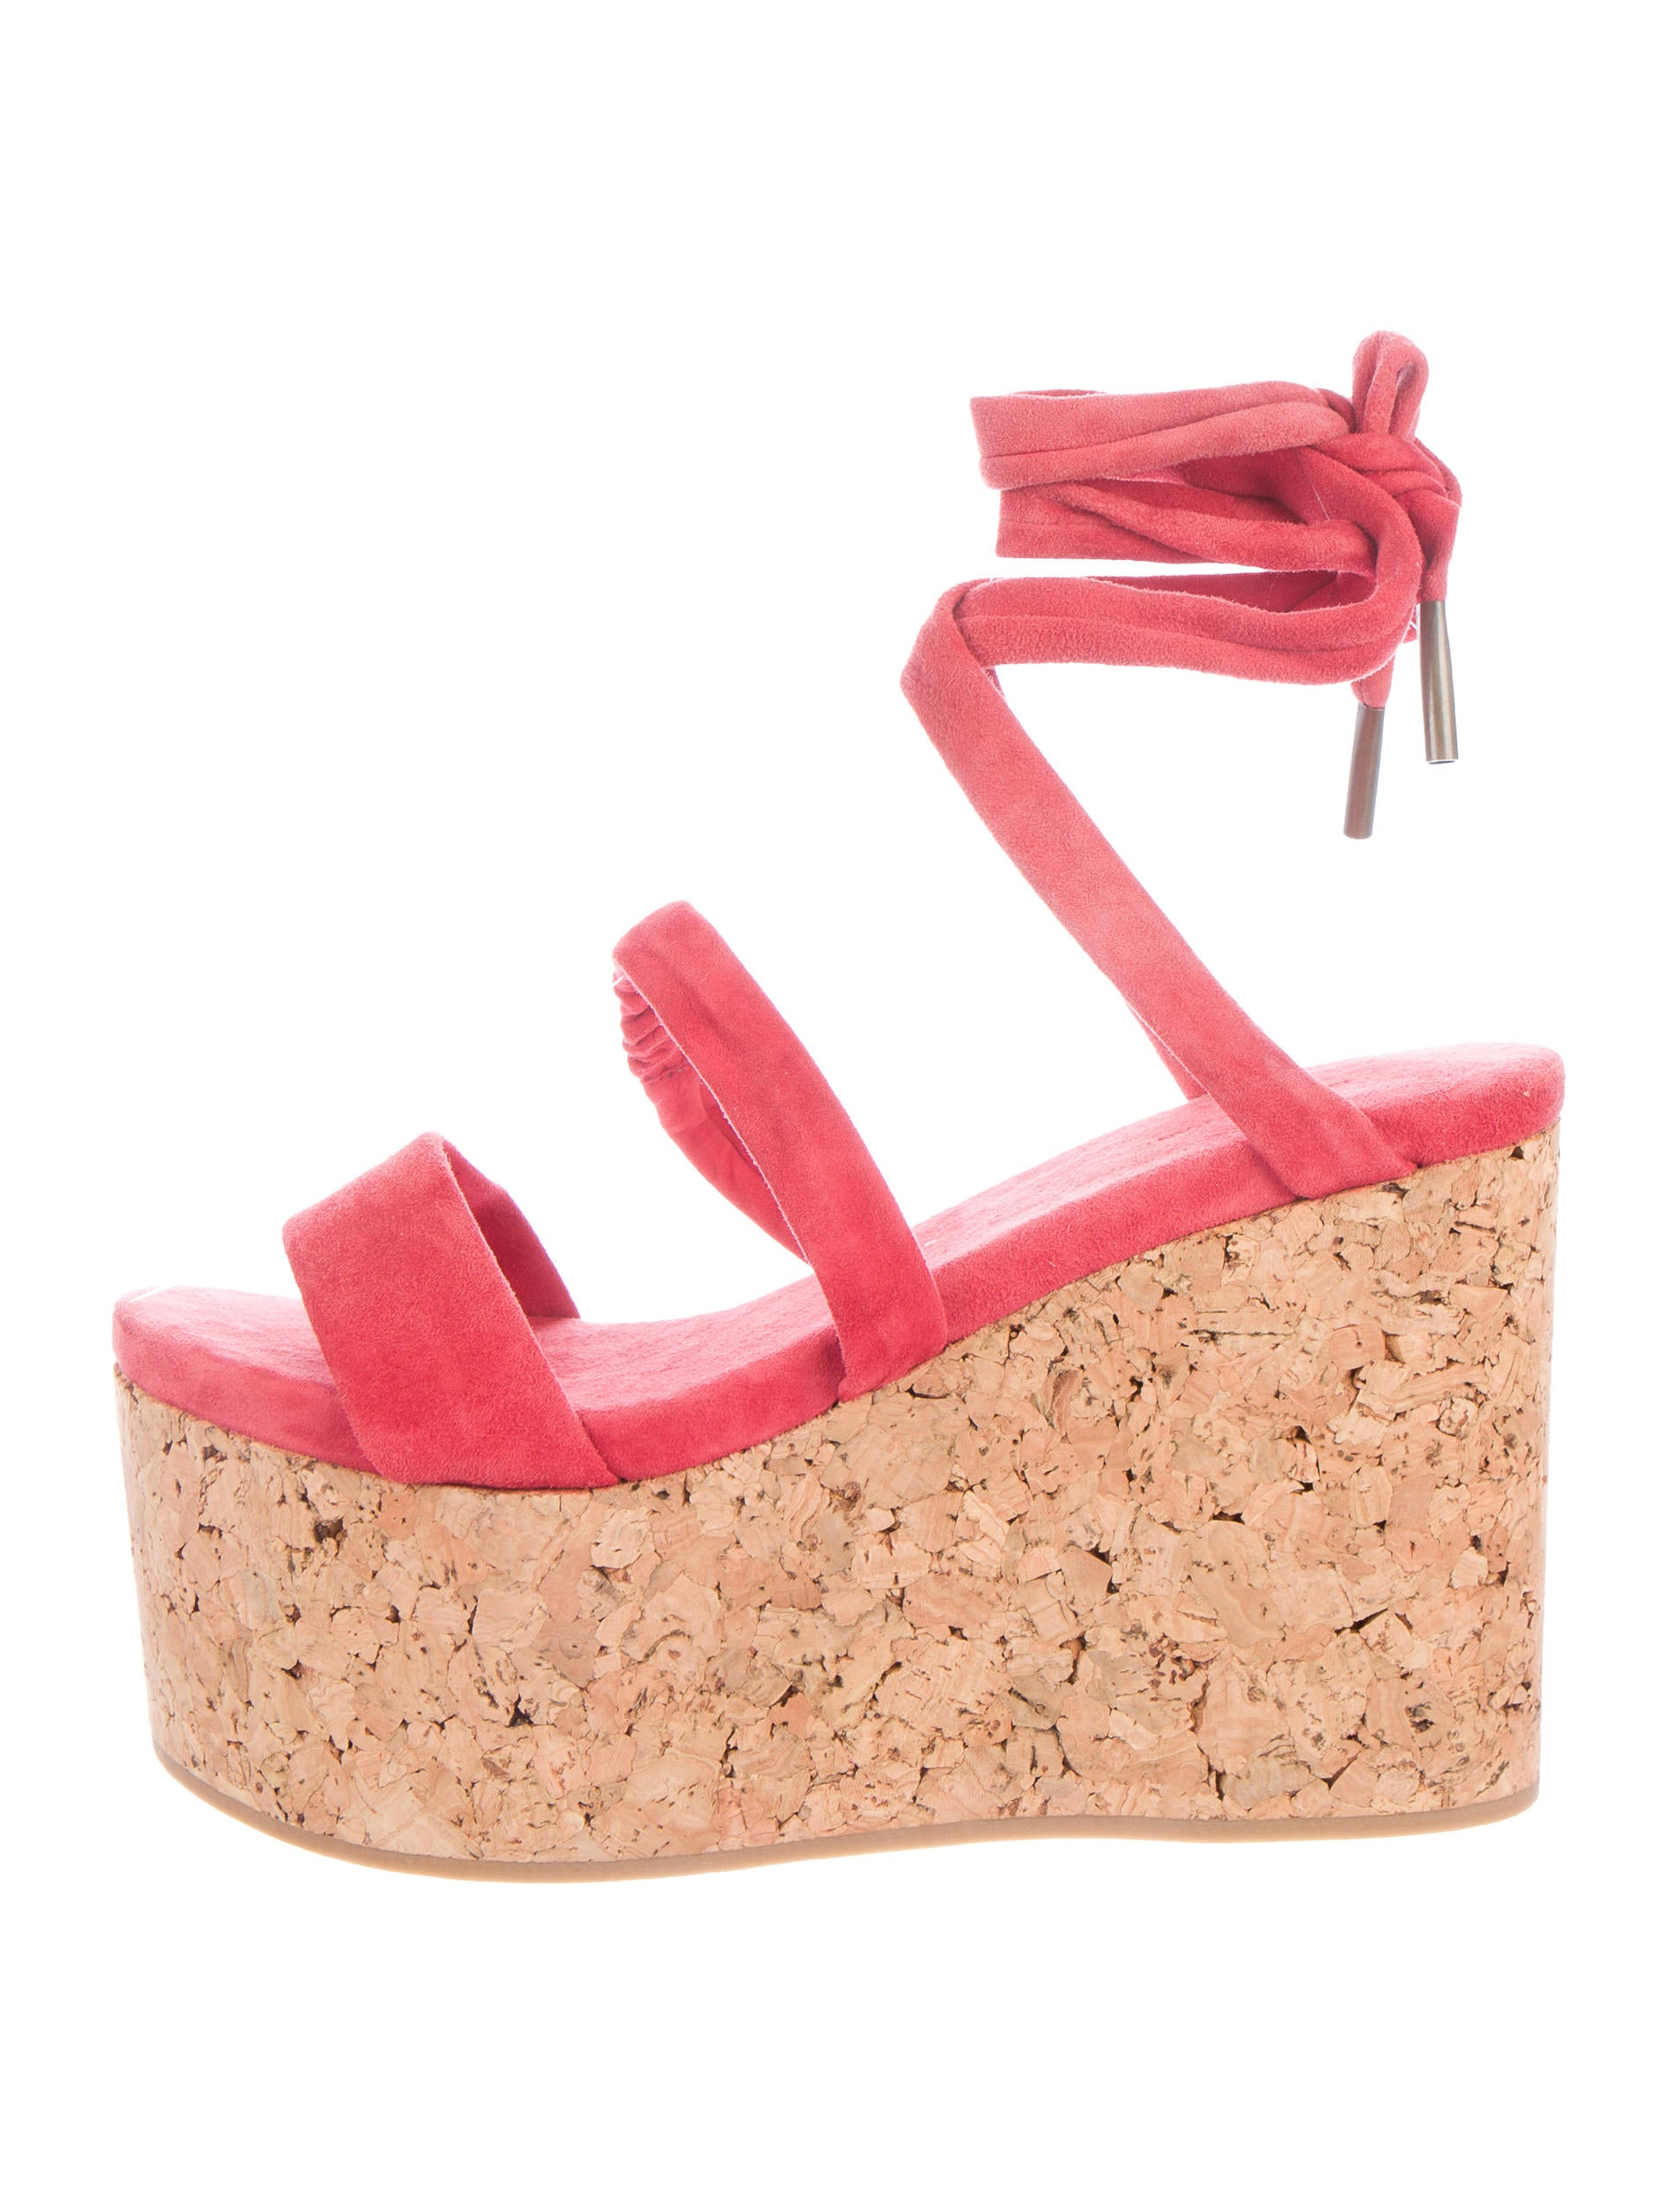 d44597c9055 Isabel Marant Suzy Platform Wedges - Shoes - ISA34088